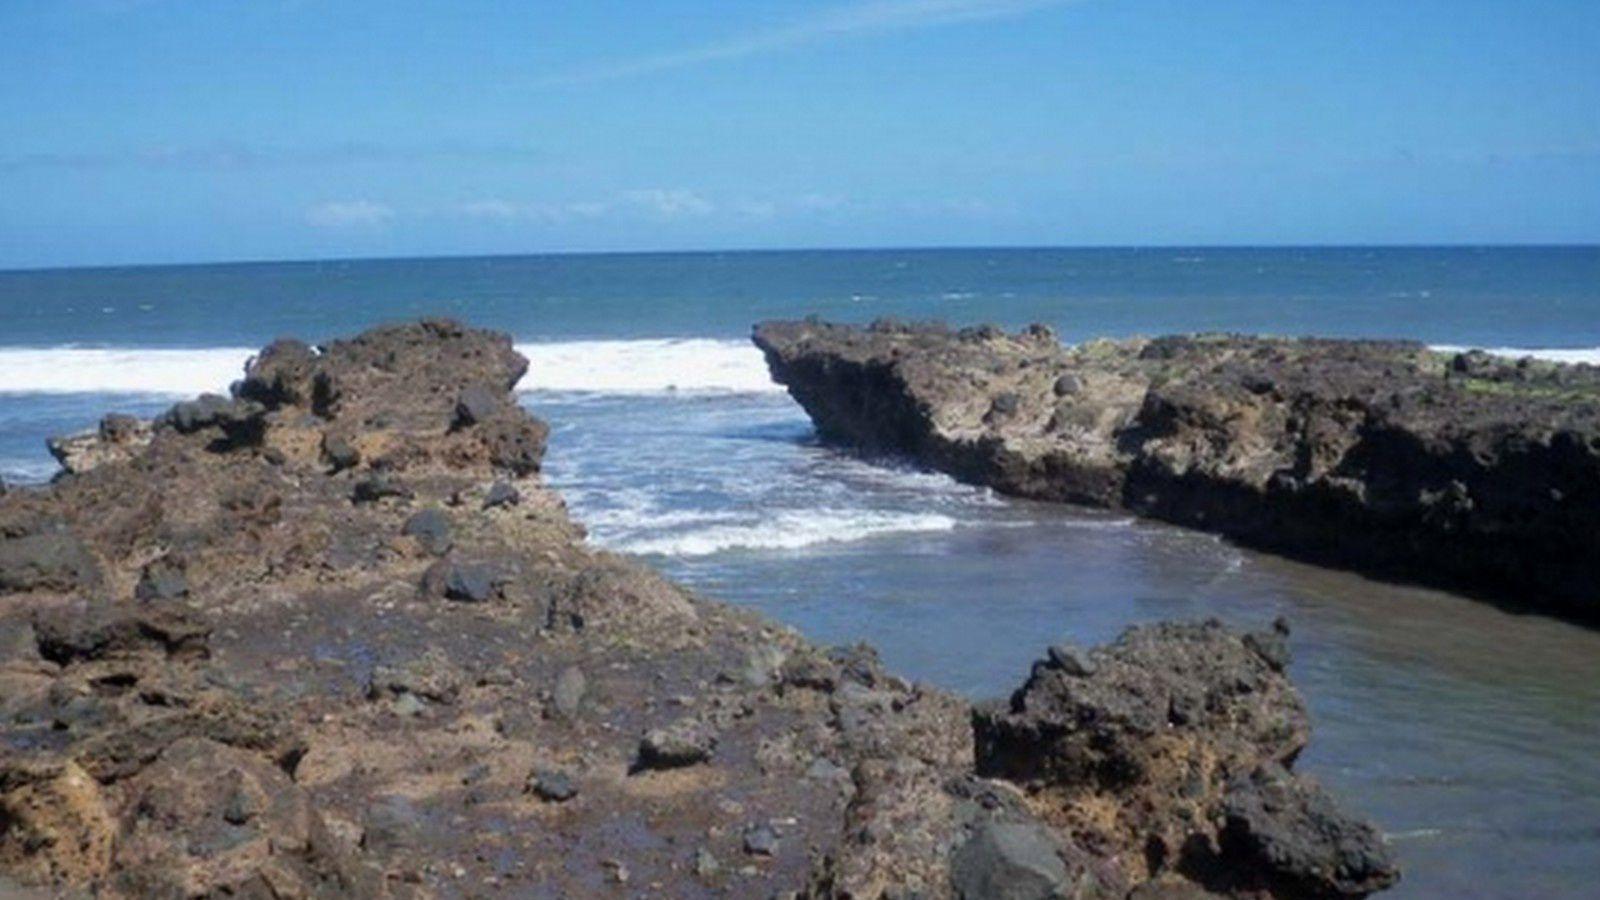 Blog sur Bali - Balibalik - Plages et rochers à Bali - Pantai karang di Bali - Pantai Atuh Nusa Dua - Tugel Padang Bai - Uwug Nusa Penida ...